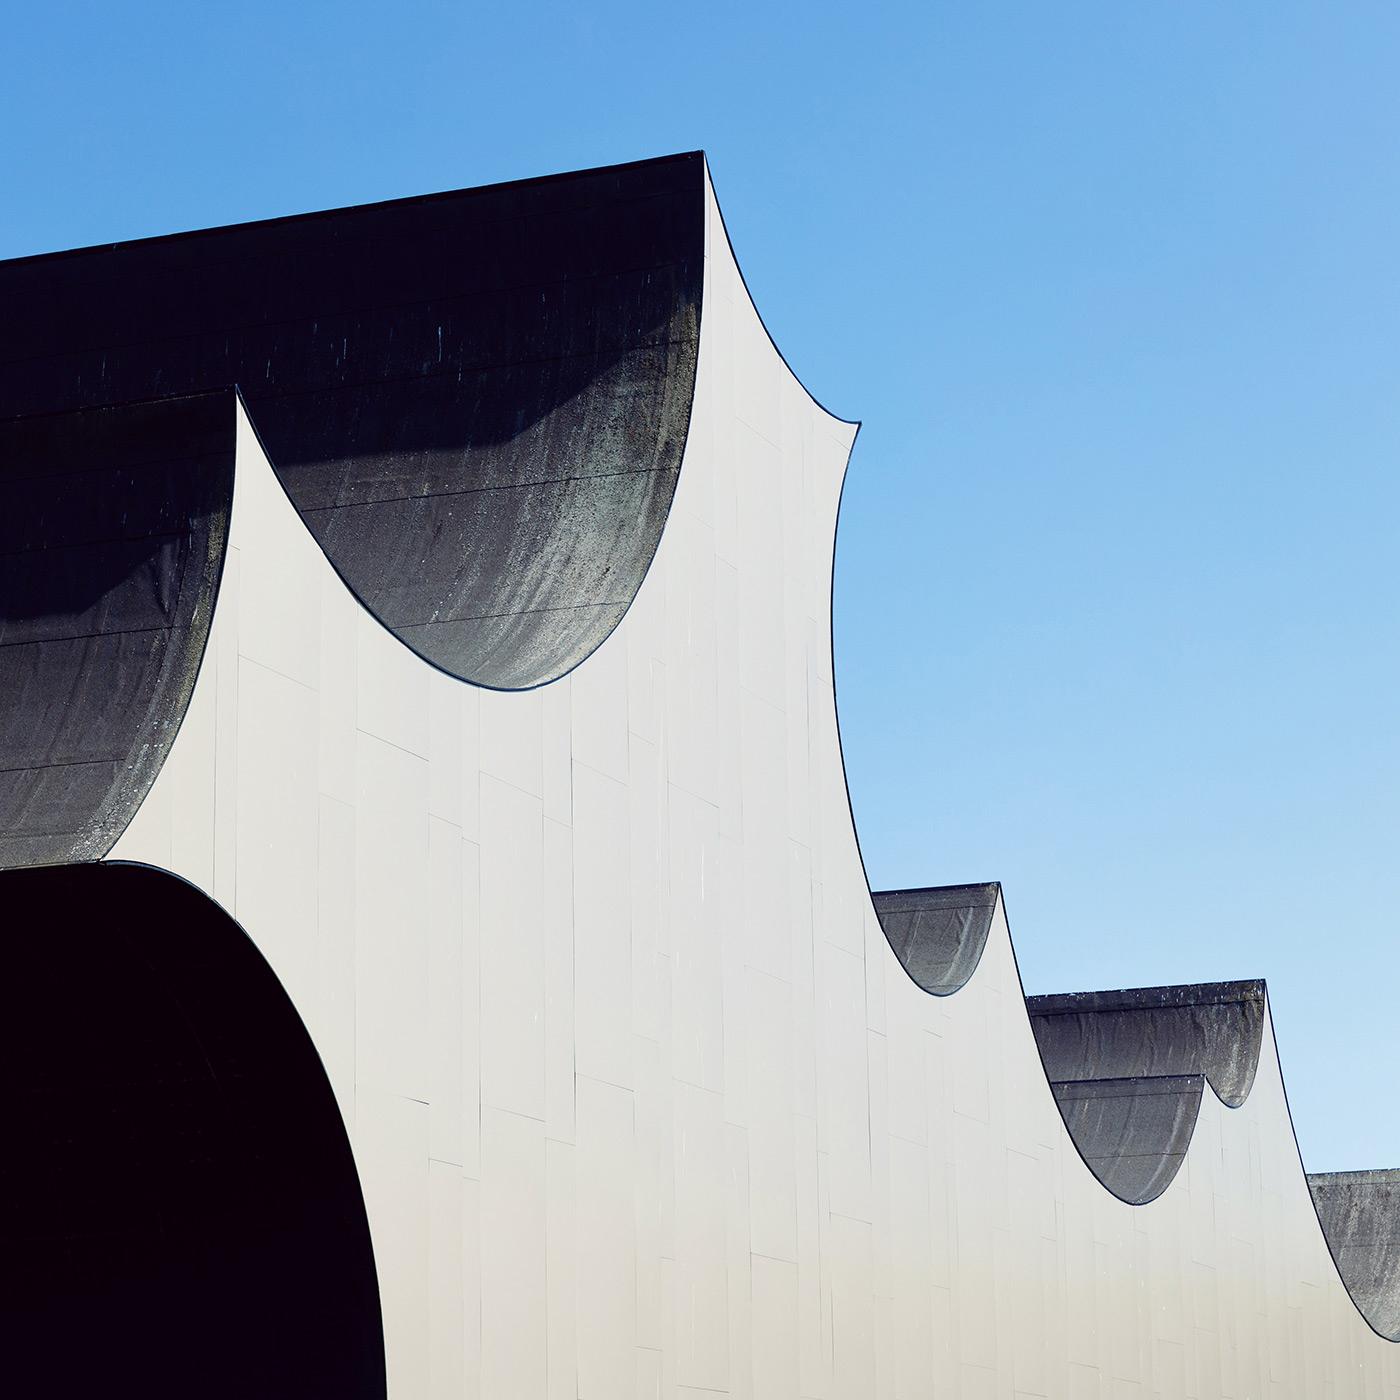 Danfoss Universe Location: Nordborg, Denmark Architects: J. Mayer H. Architects